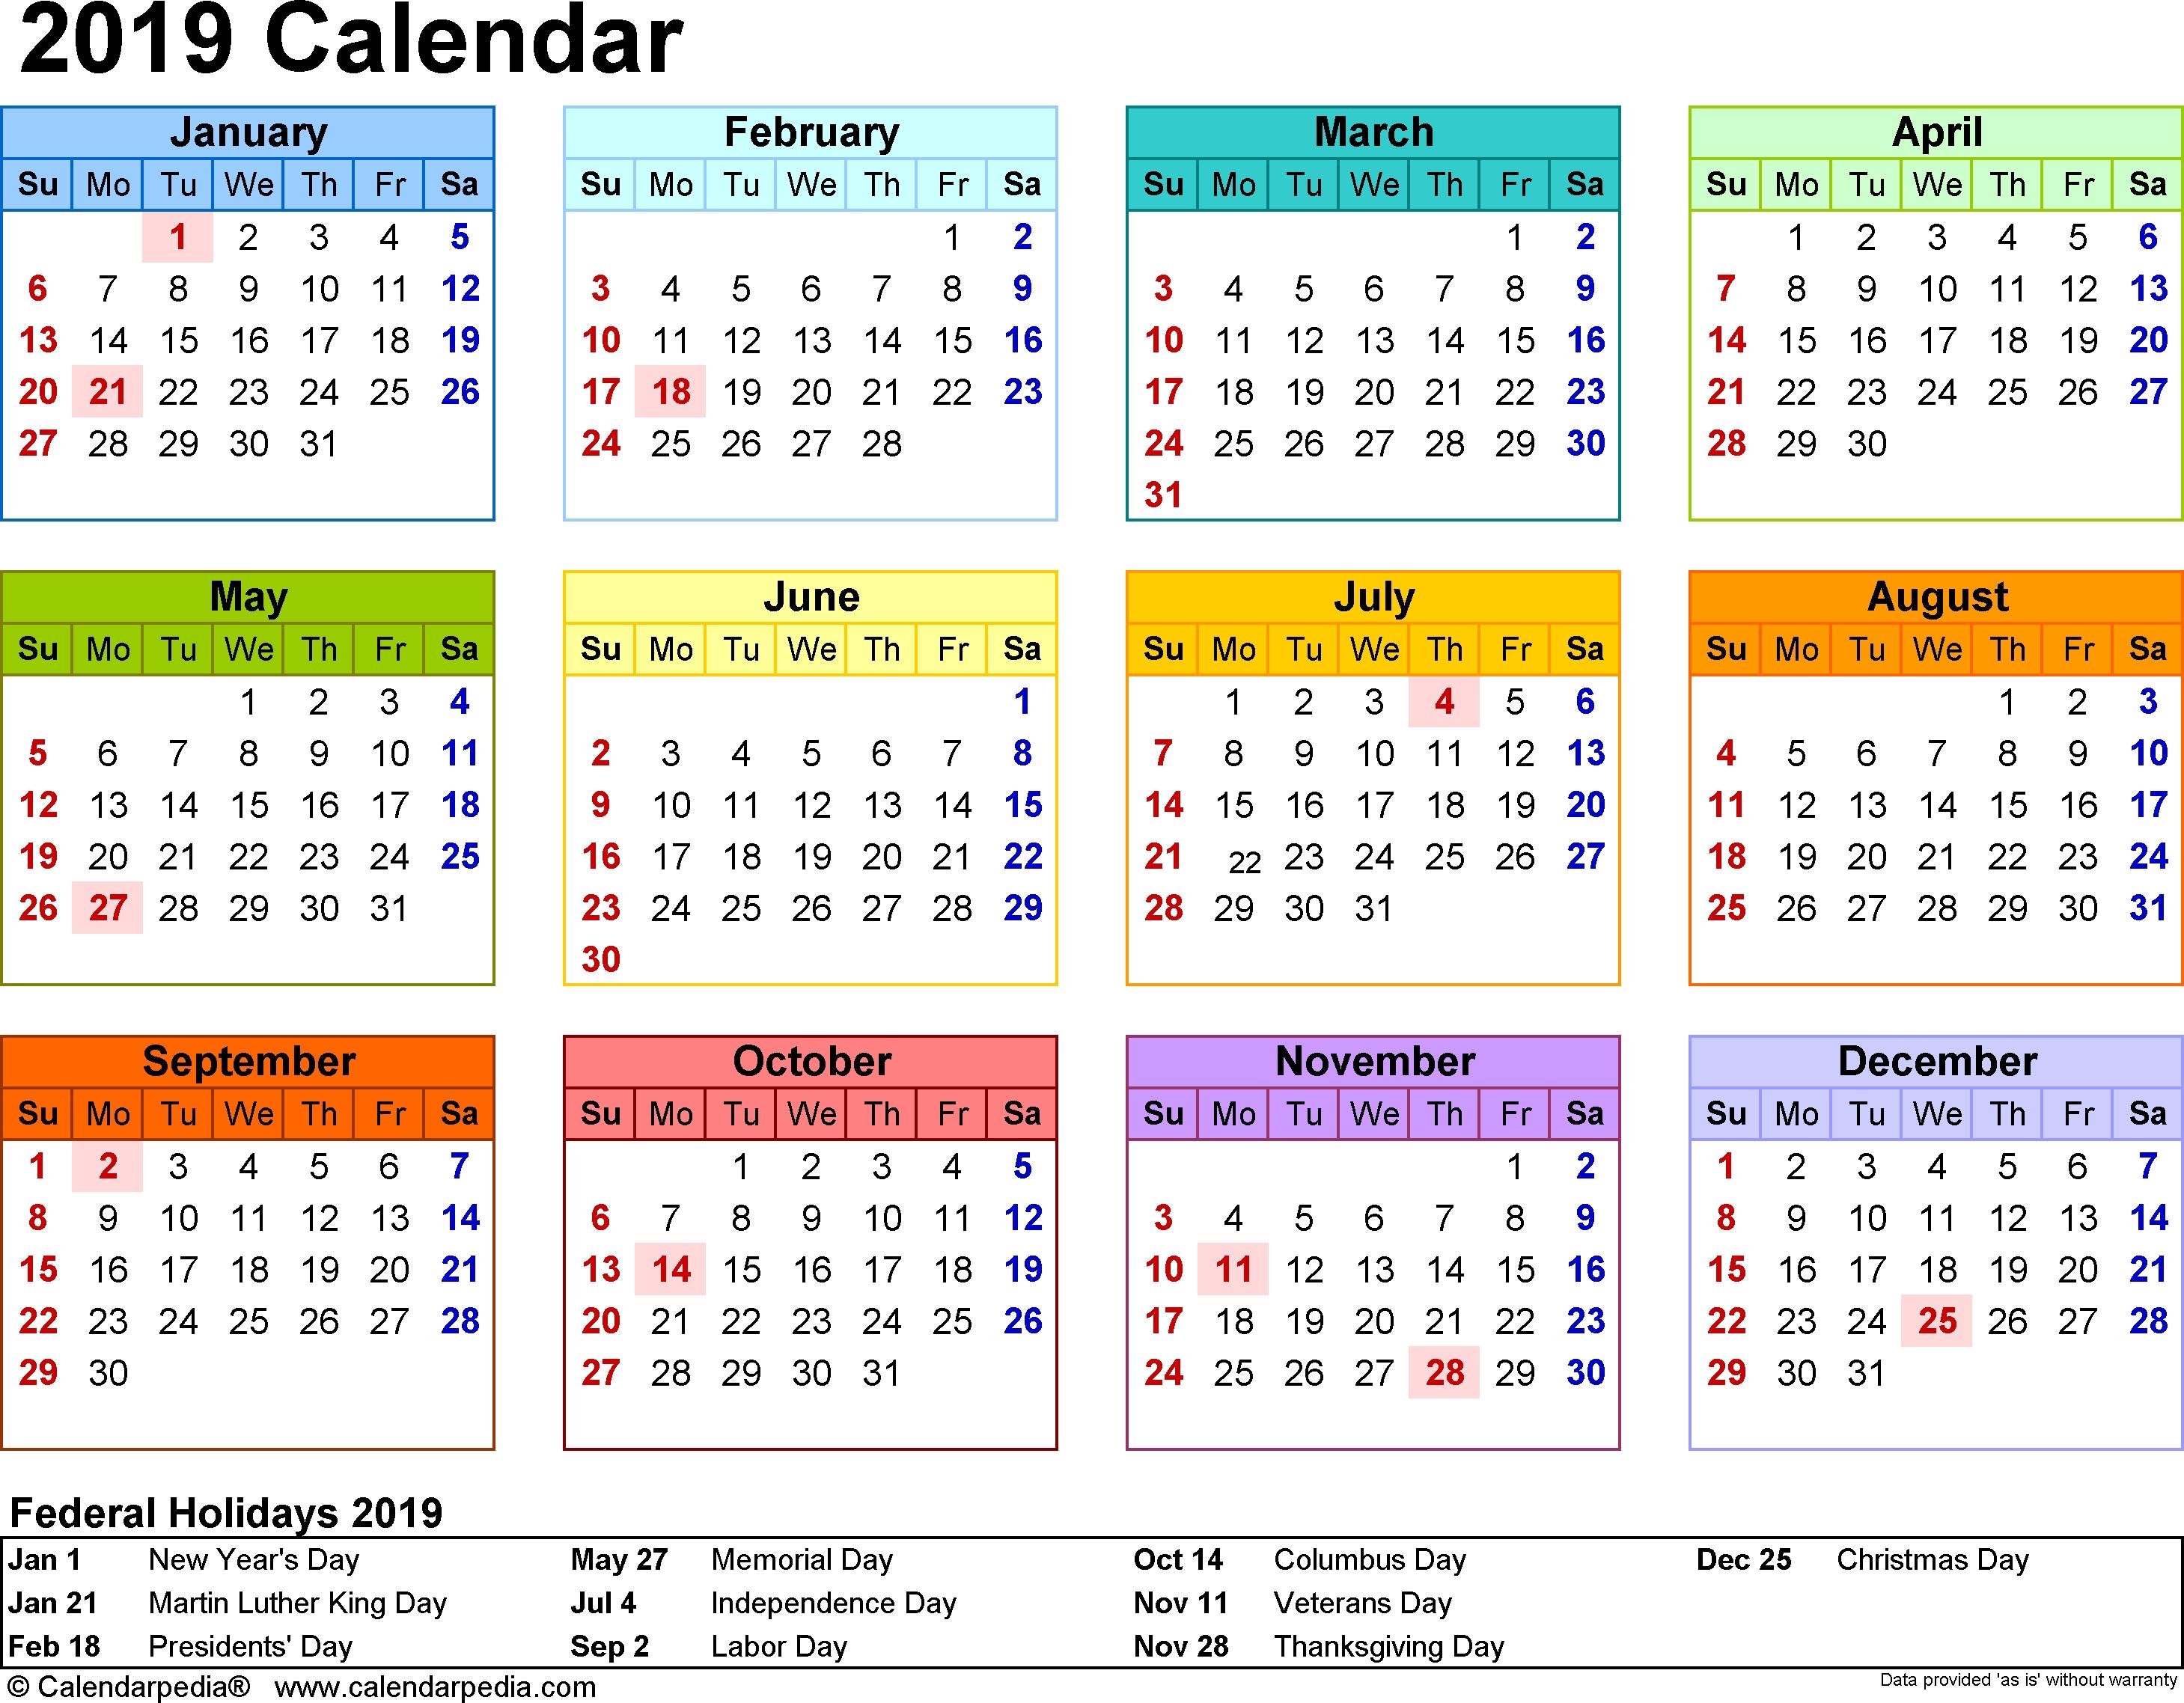 March 2019 Holiday Calendar Uk | 2019 Calendars | Calendar-Monthly Calendar Uk Printable